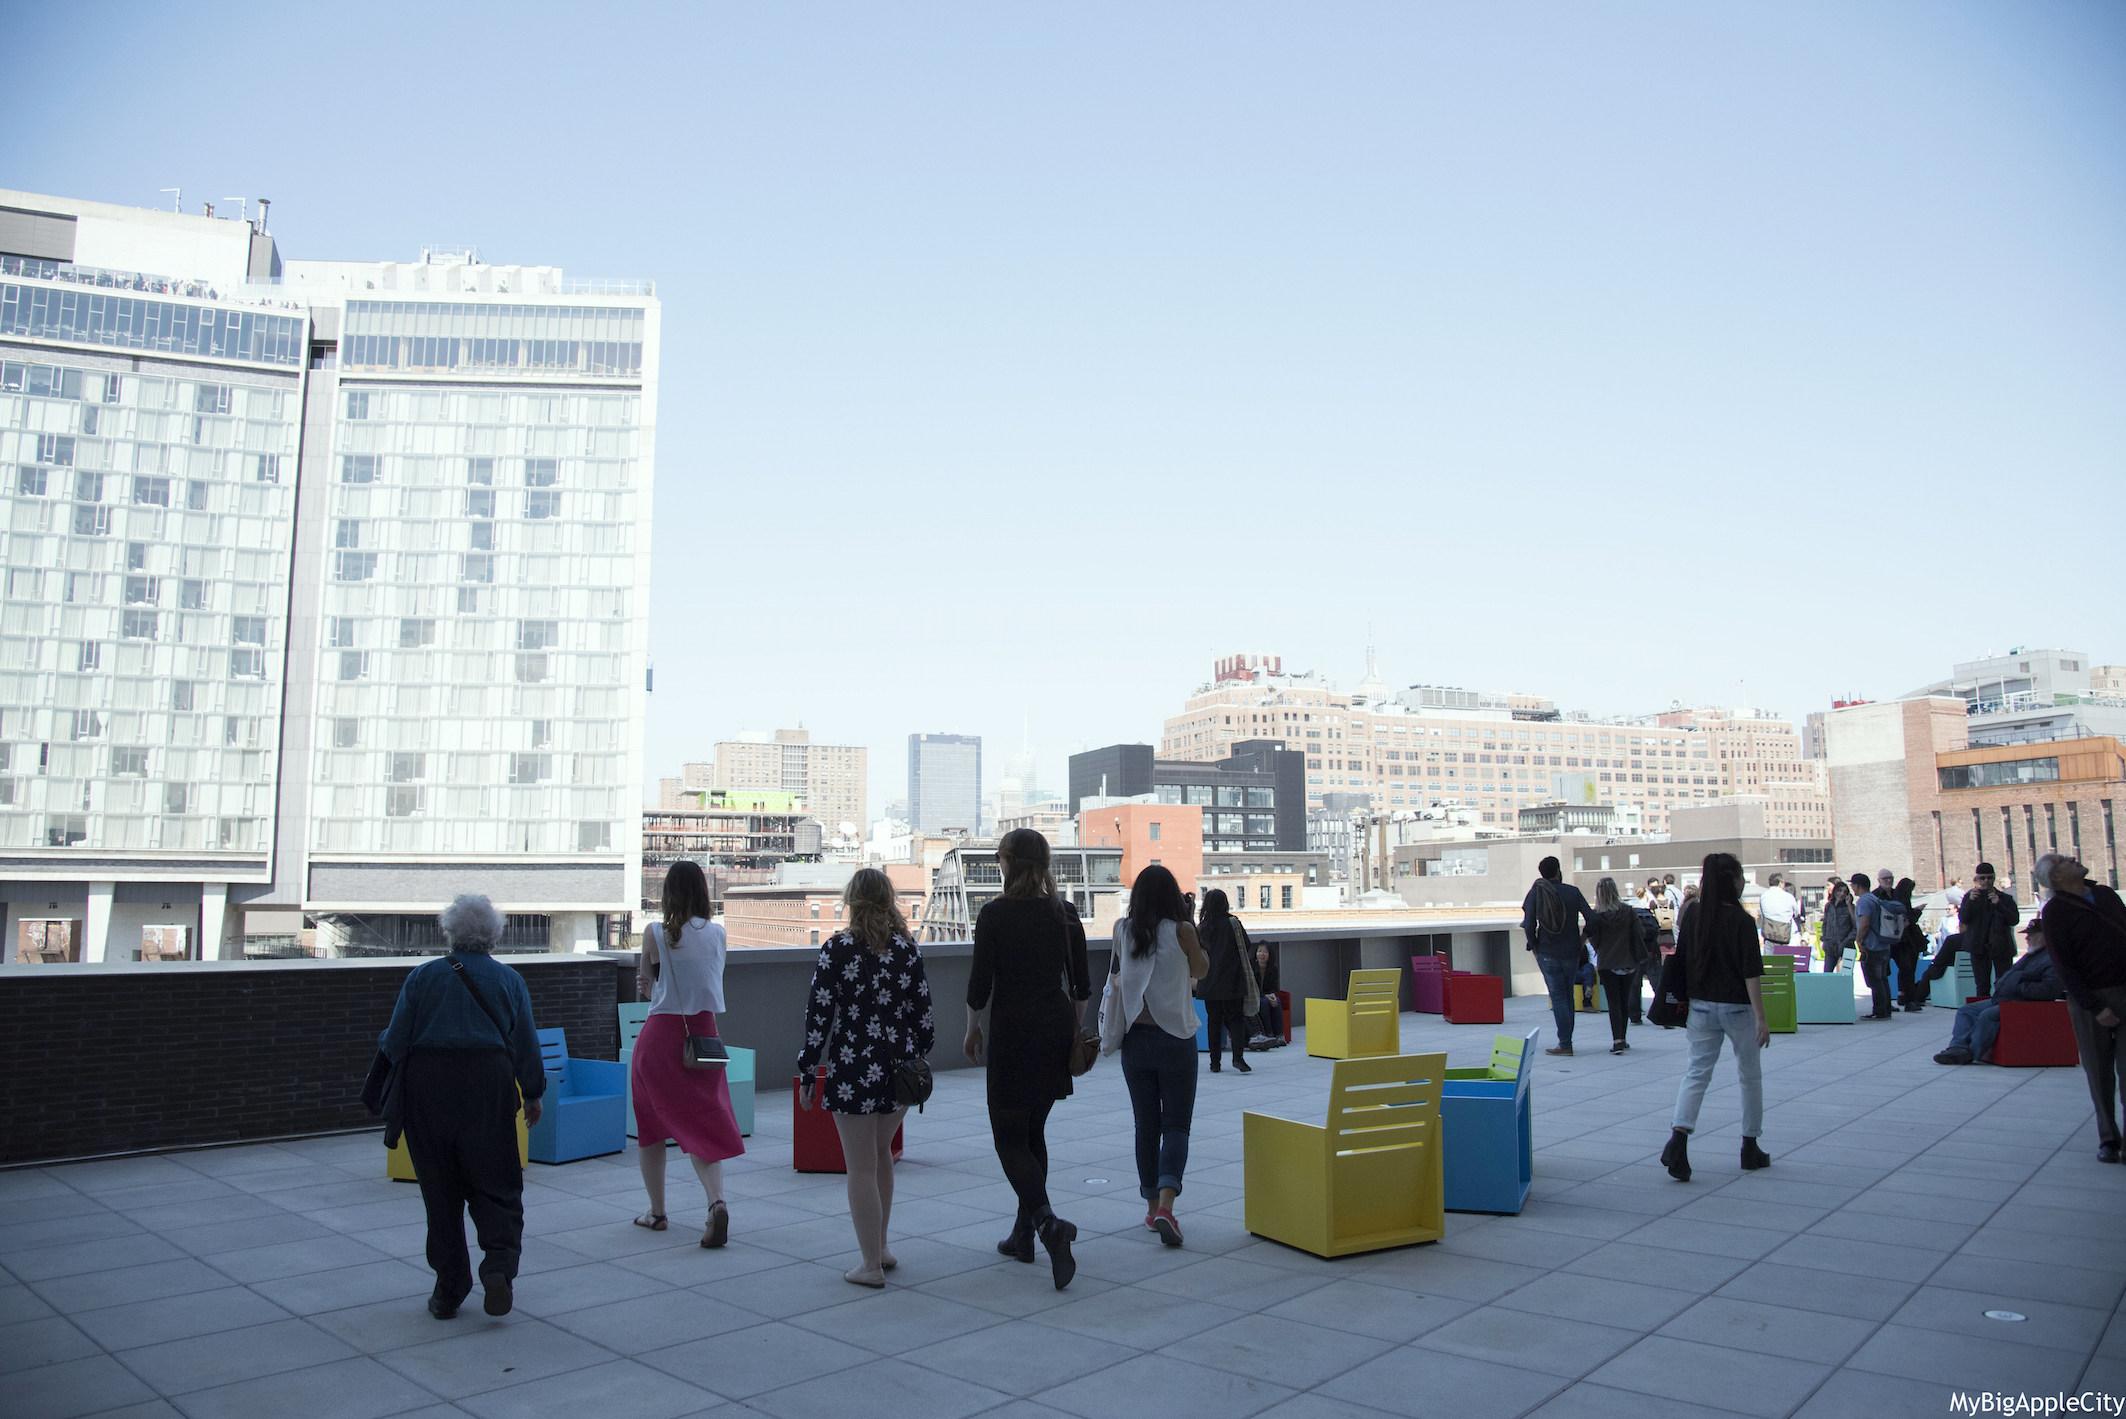 Whitney-Museum-NYC-rooftop-view-travel-mybigapplecity